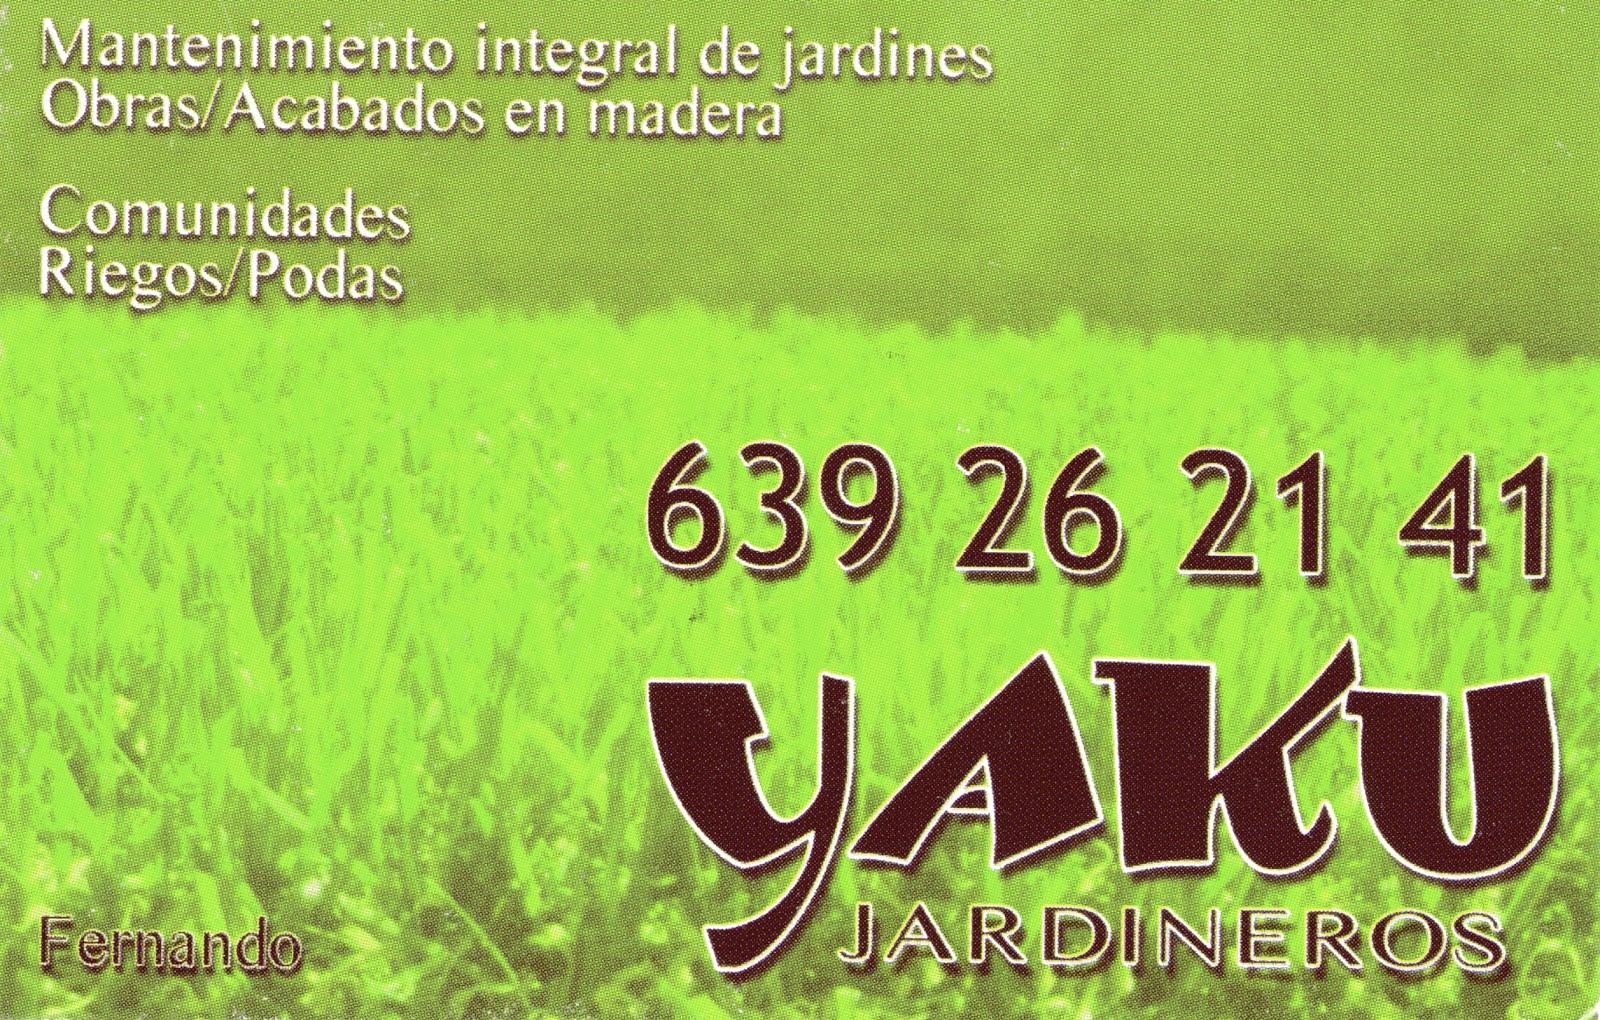 Yaku mantenimiento de jardines